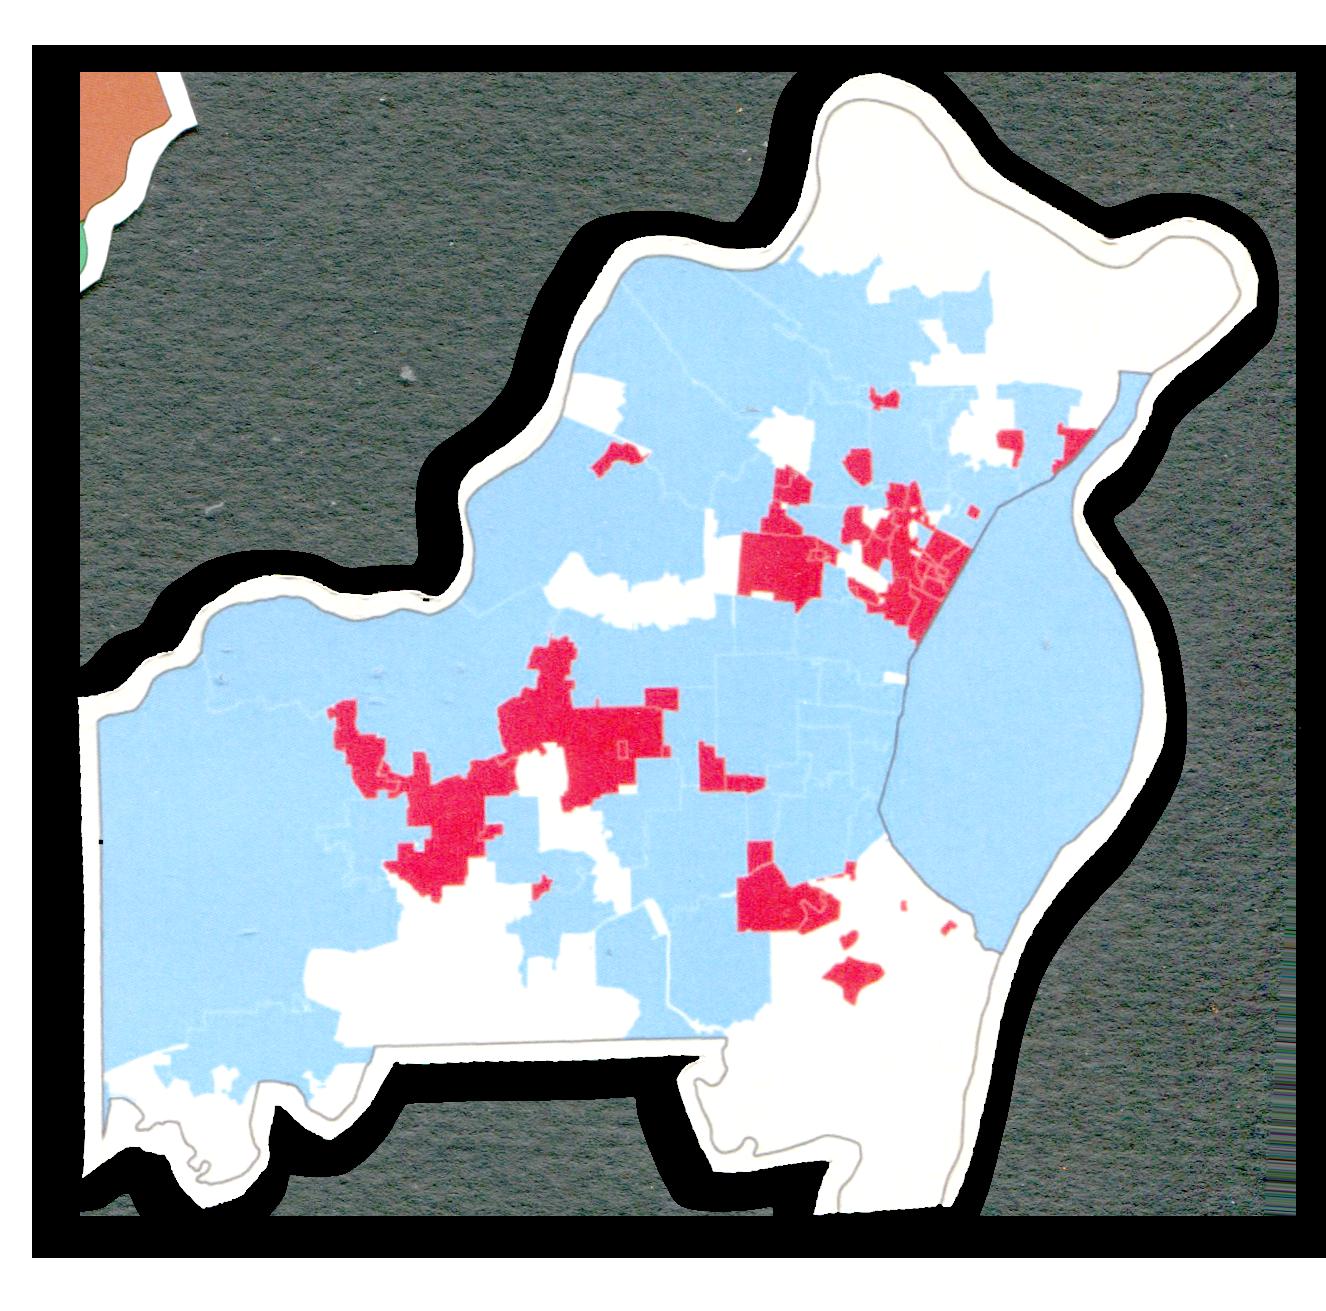 St. Louis, Debt map